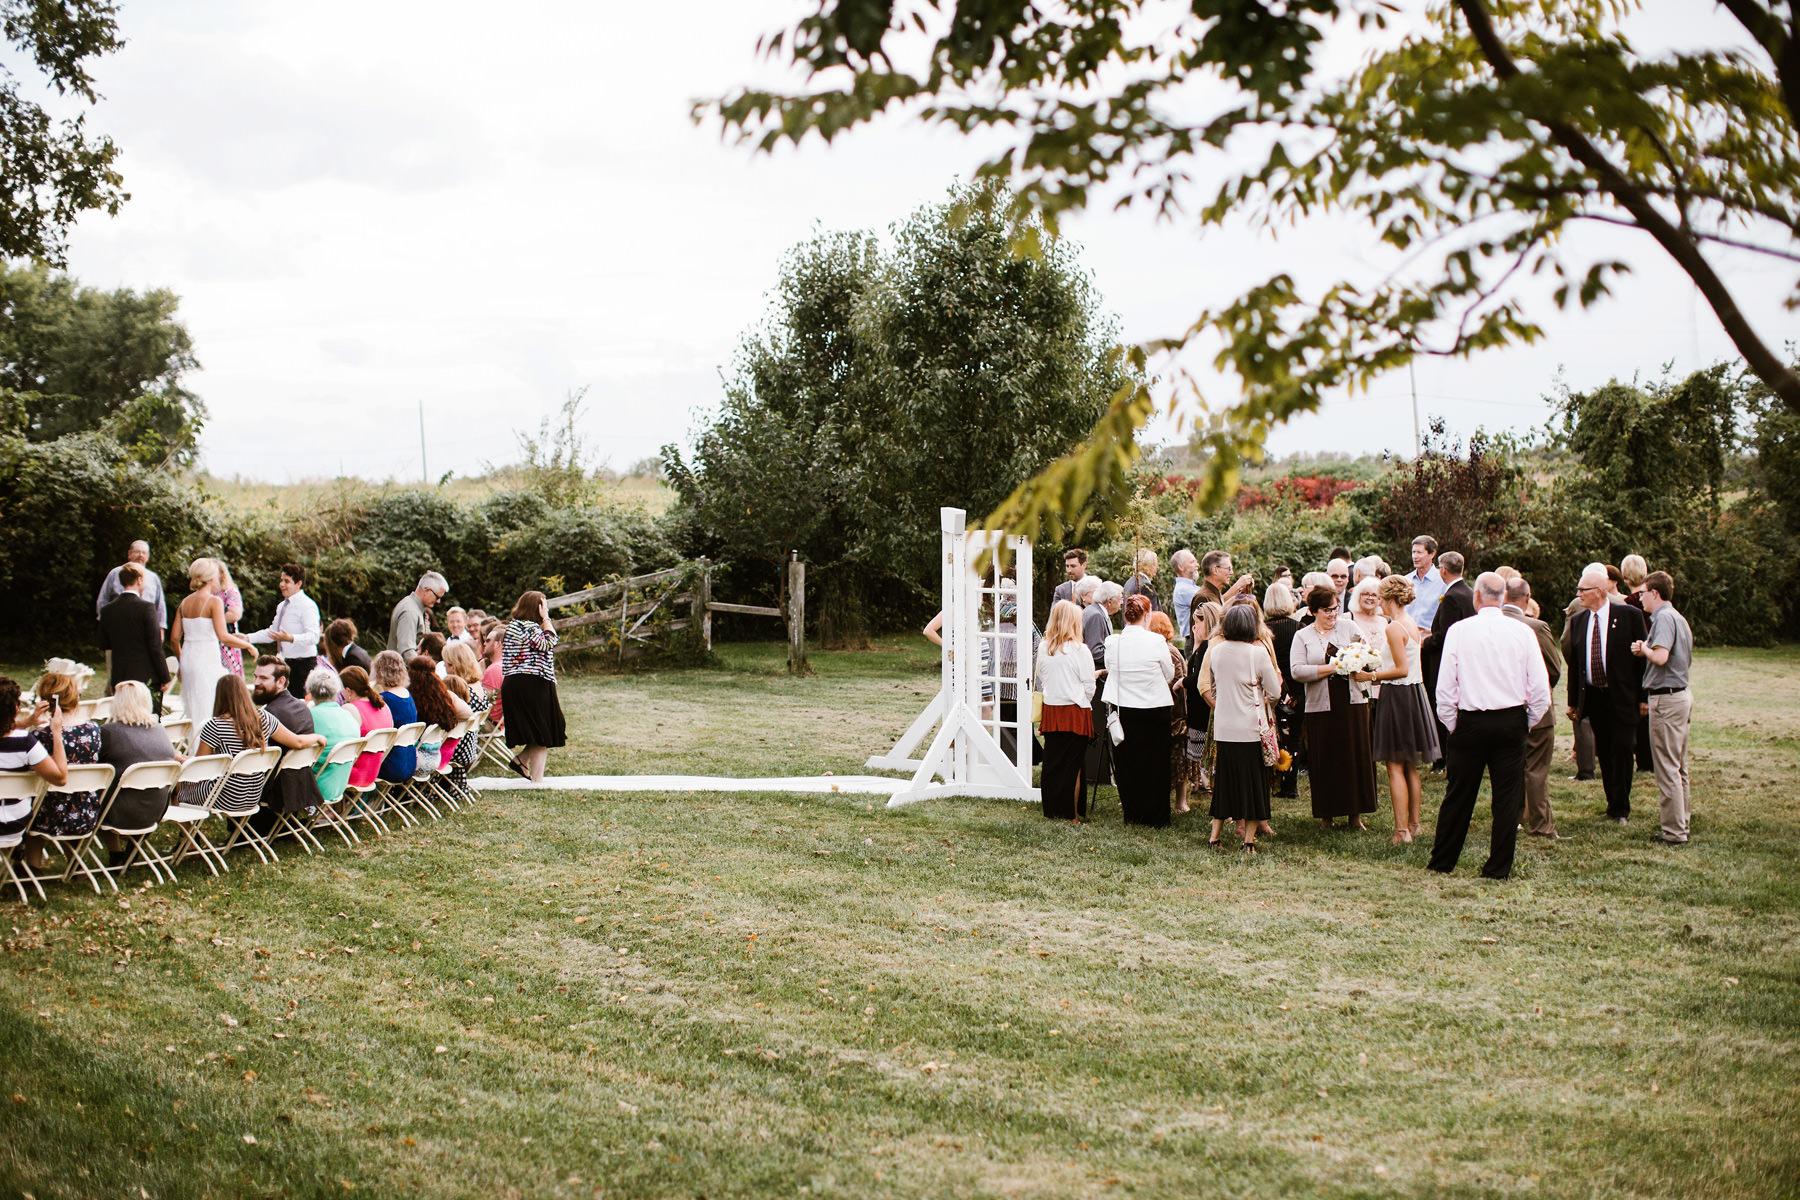 Alldredge Orchard Kansas City_Kindling Wedding Photography BLOG 52.JPG